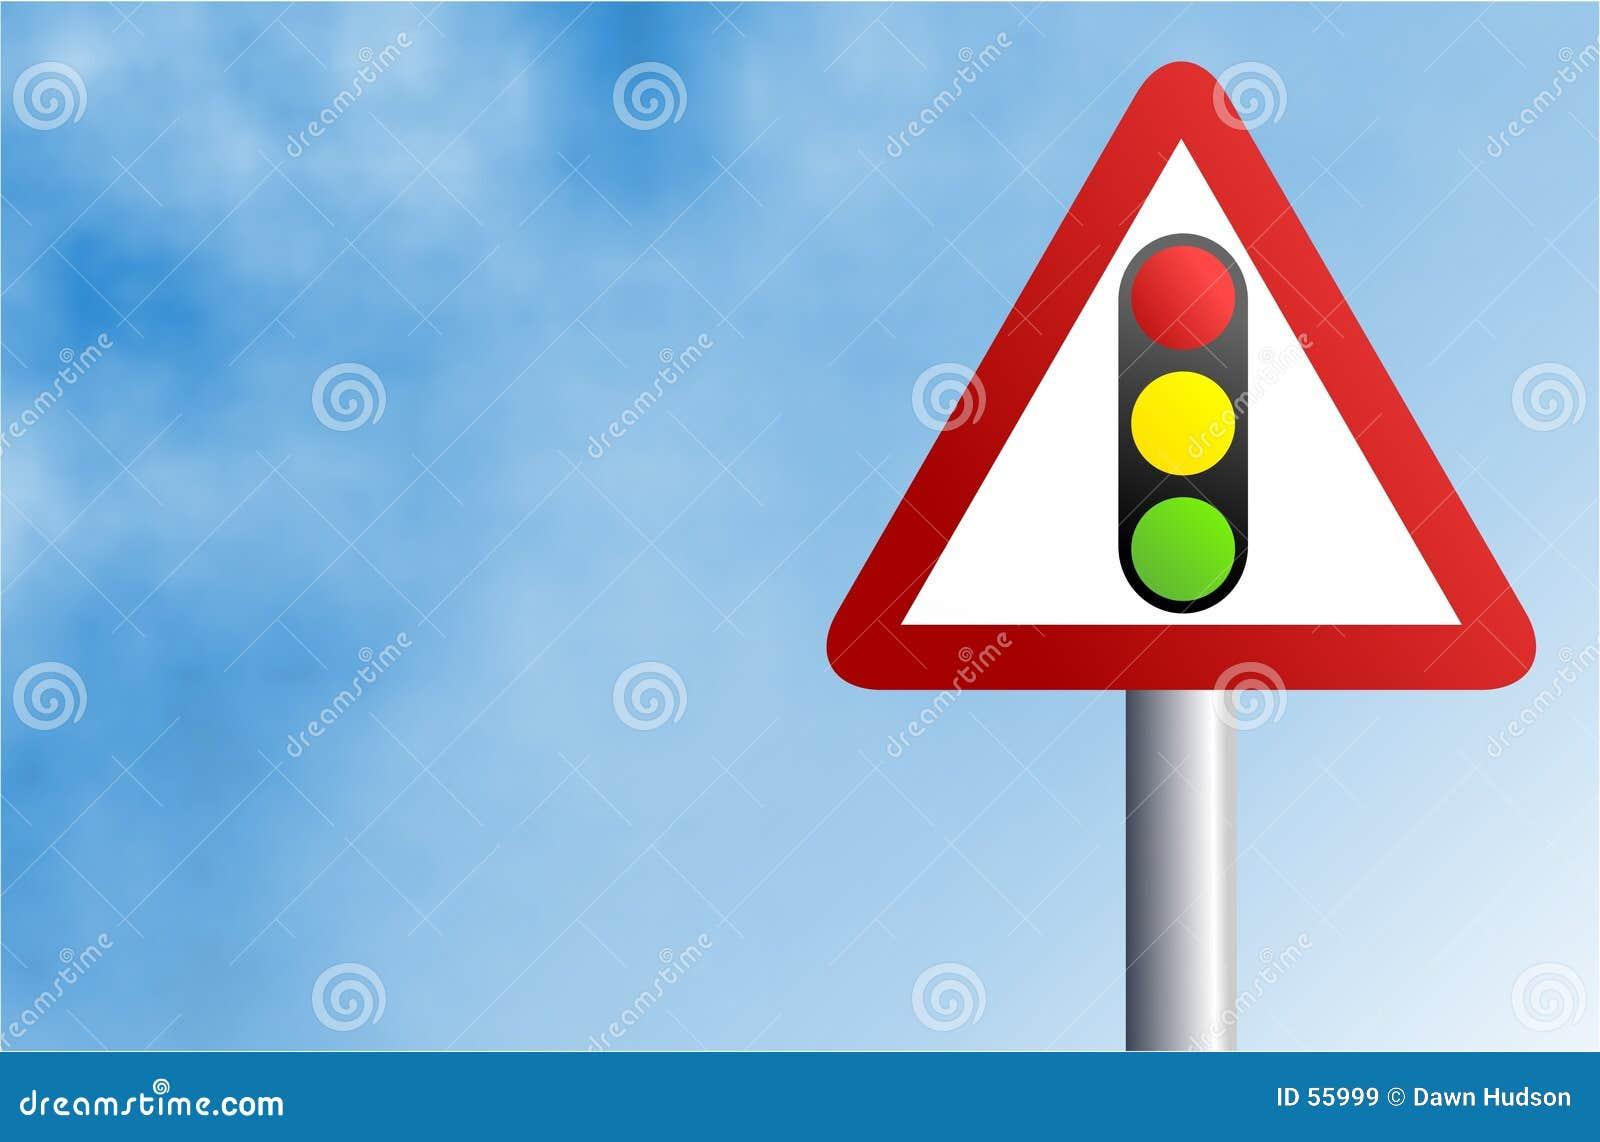 Light sign traffic